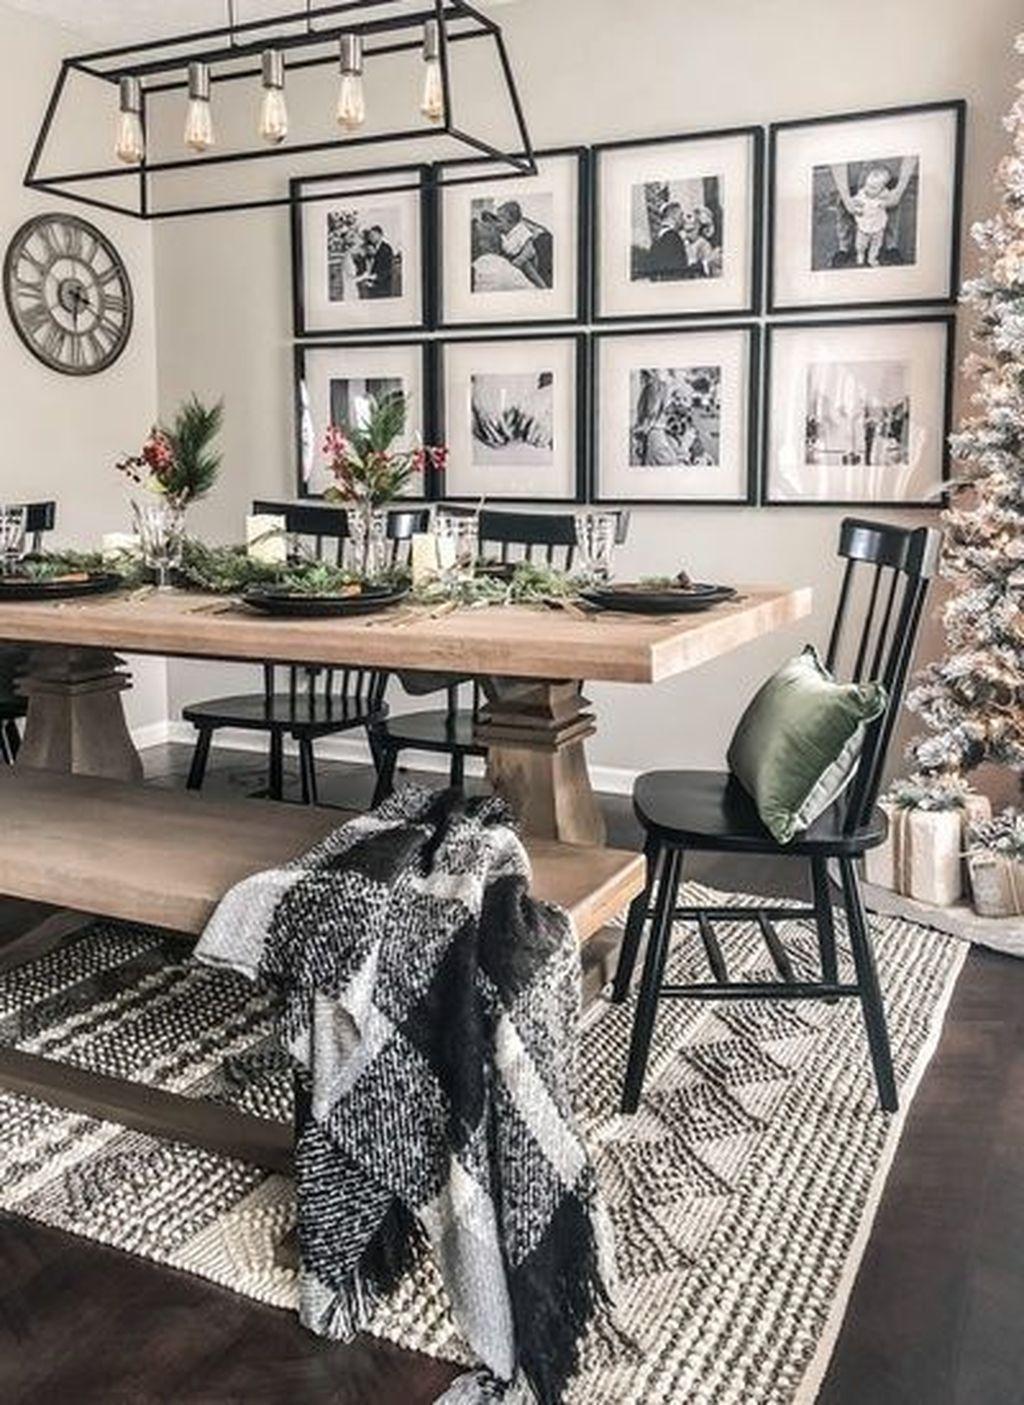 32 popular modern farmhouse kitchen table design ideas in 2020 modern farmhouse kitchens on kitchen decor wall ideas id=44113